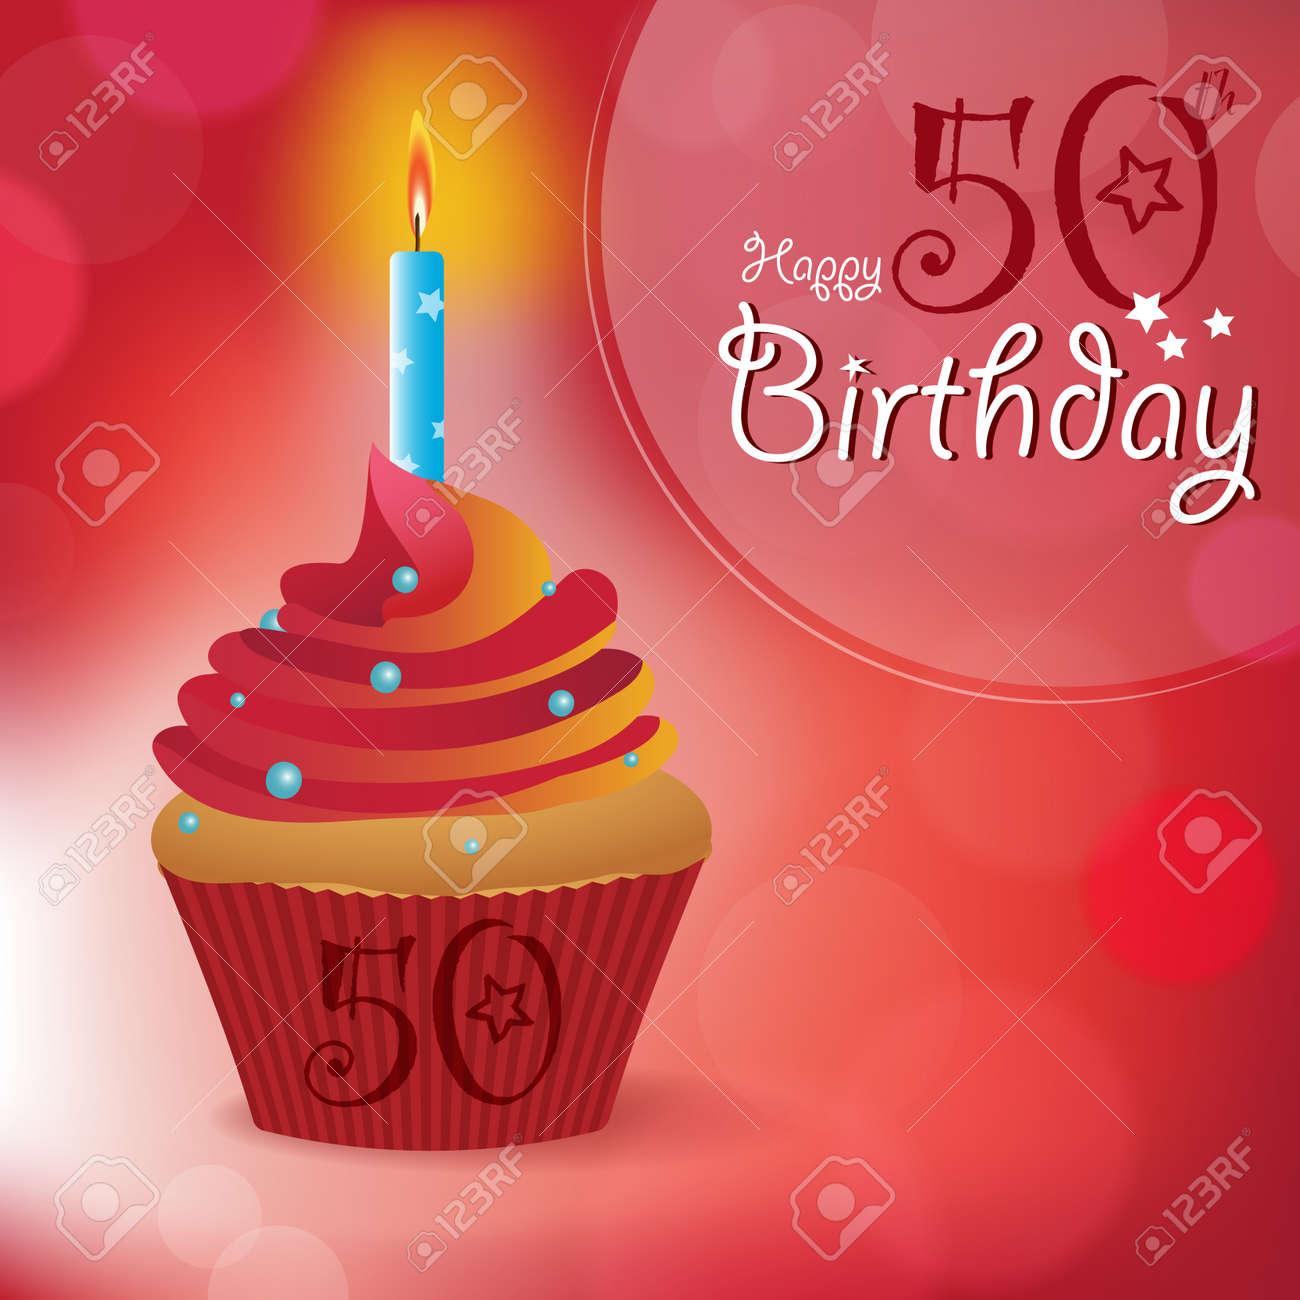 Happy 50th Birthday Greeting Invitation Message